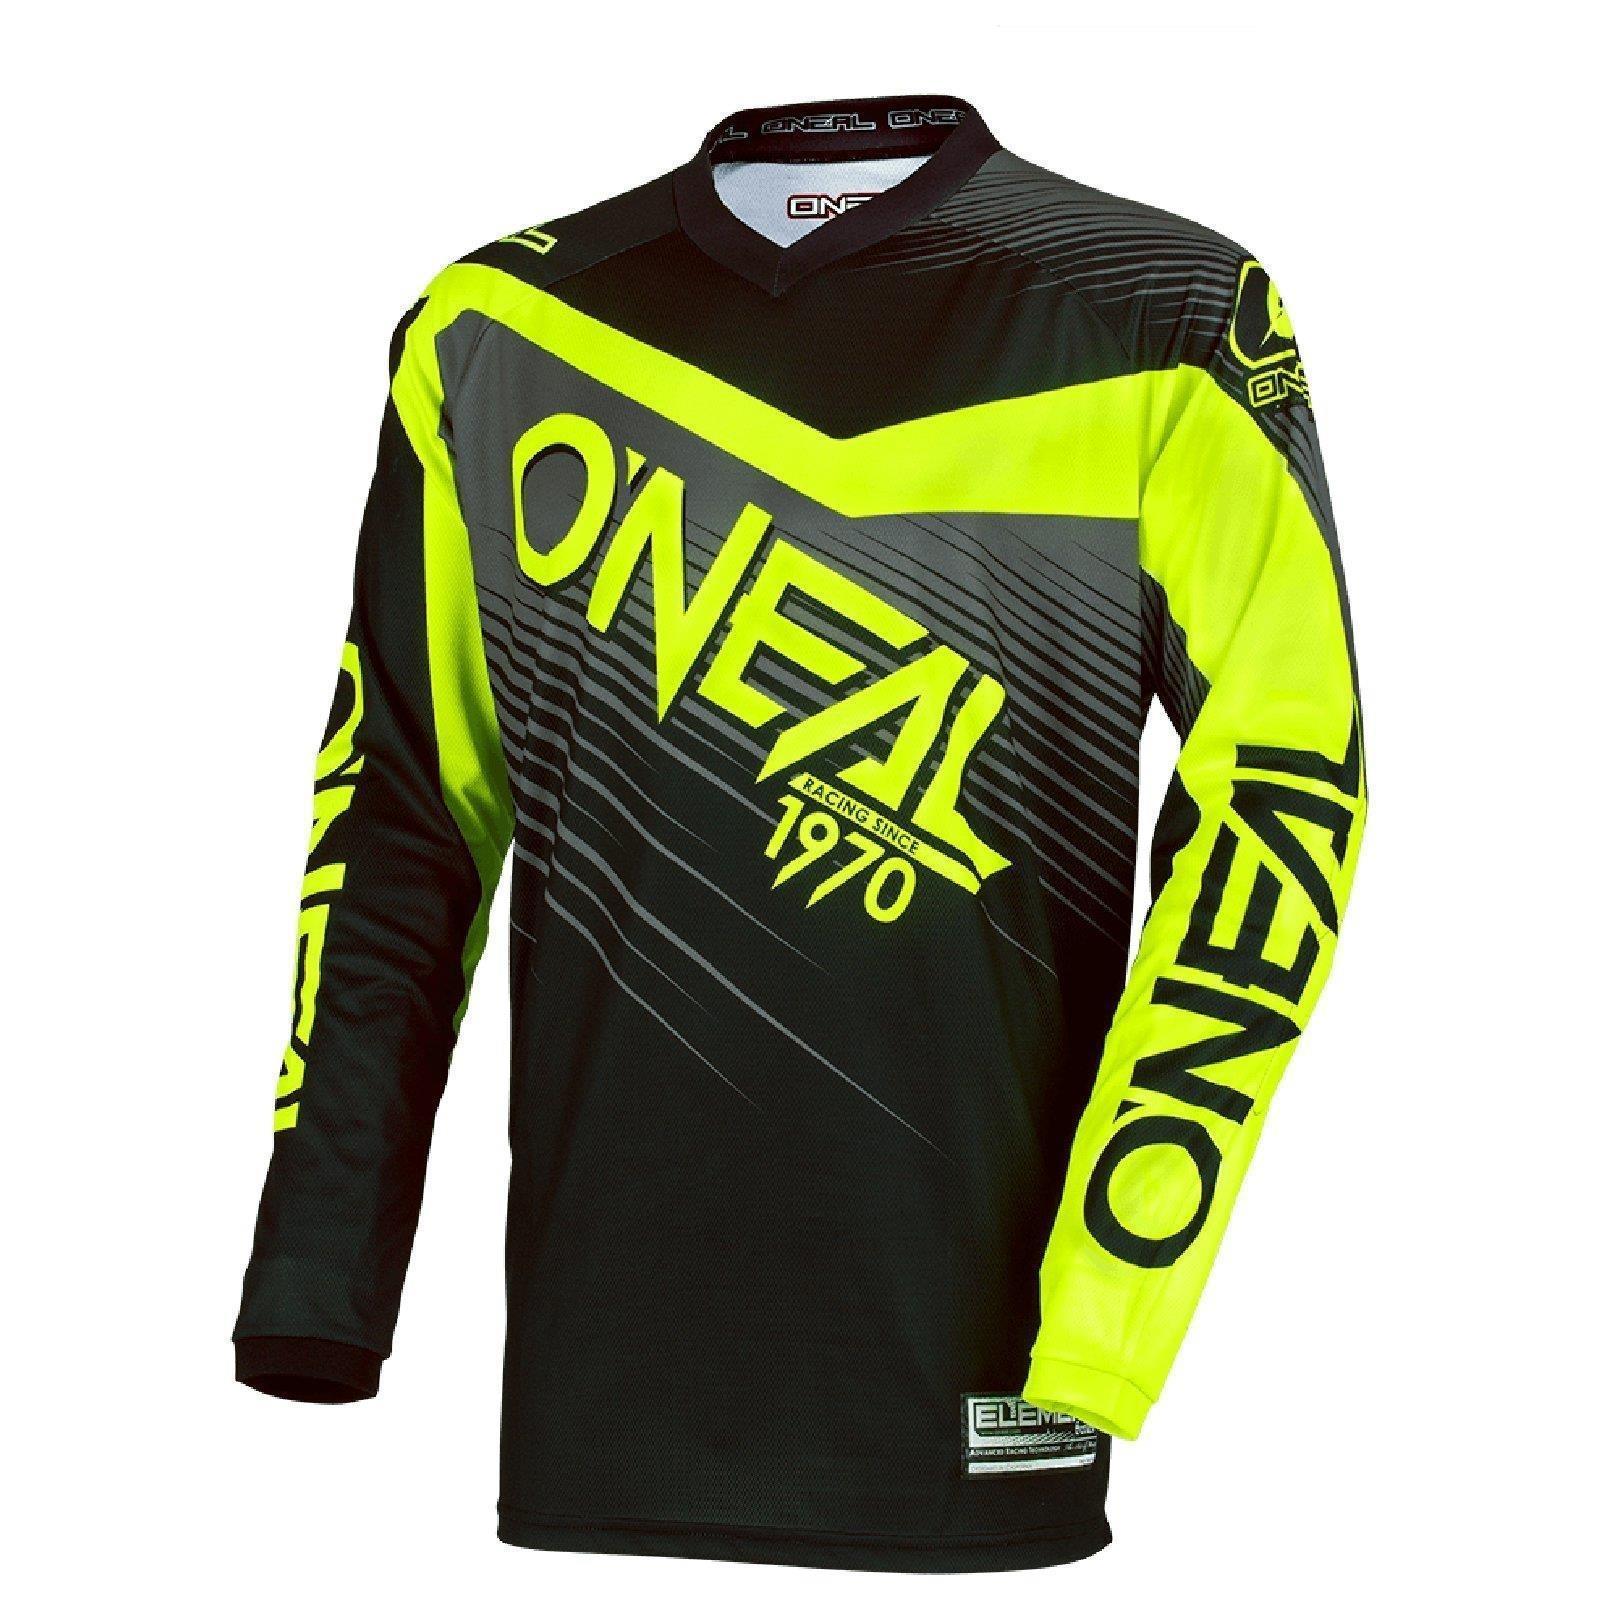 Elemento-oNeal-racewear-Jersey-pantalones-a-ninos-adulto-Motocross-Enduro-downhill miniatura 18